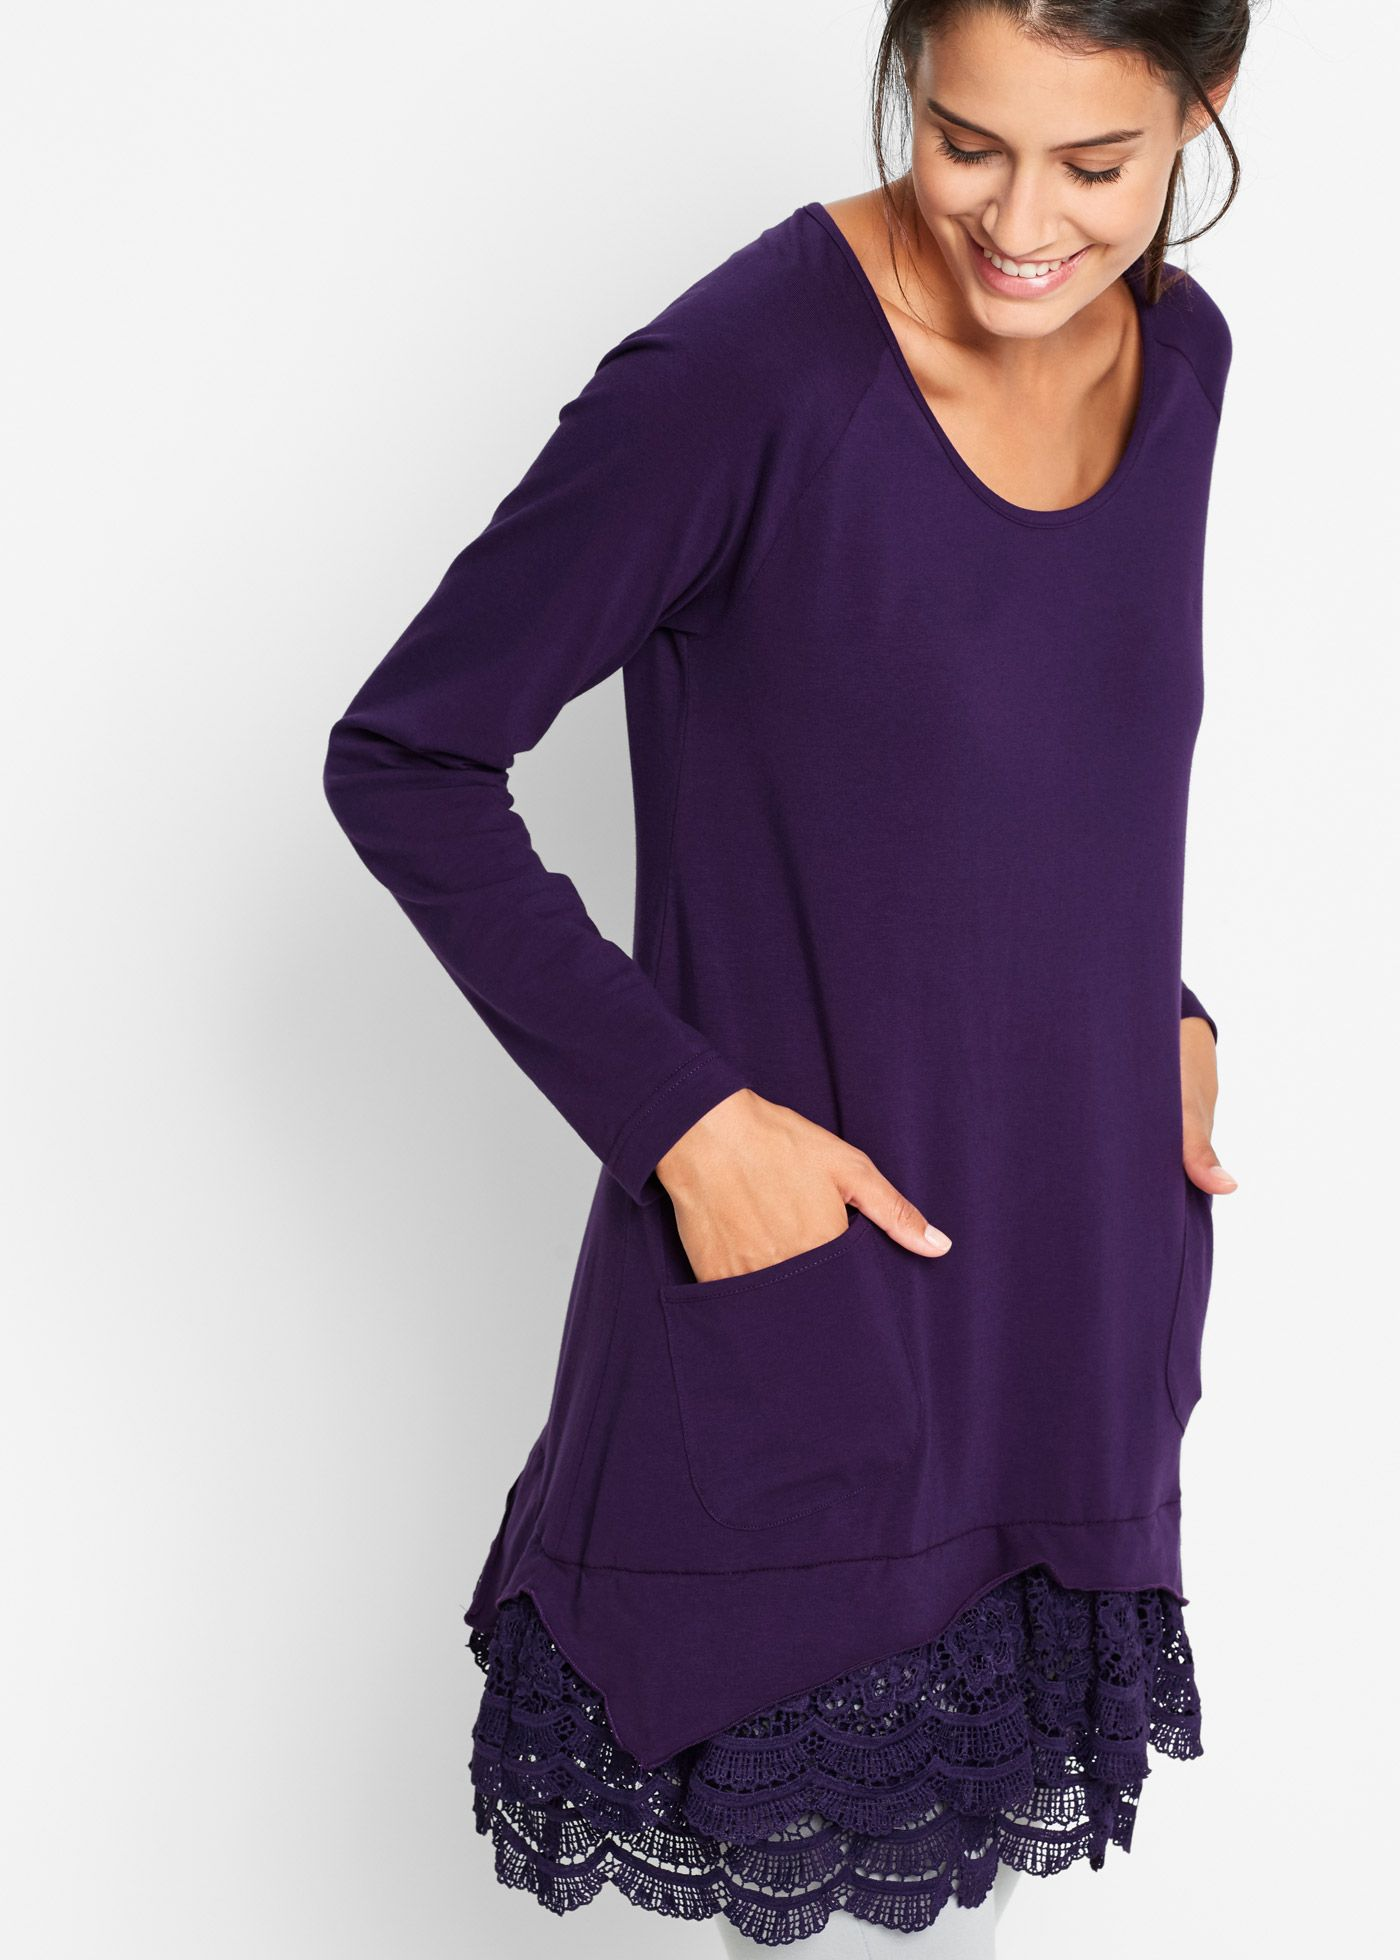 Langärmlige Shirt-Tunika mit Spitze dunkellila jetzt im Online